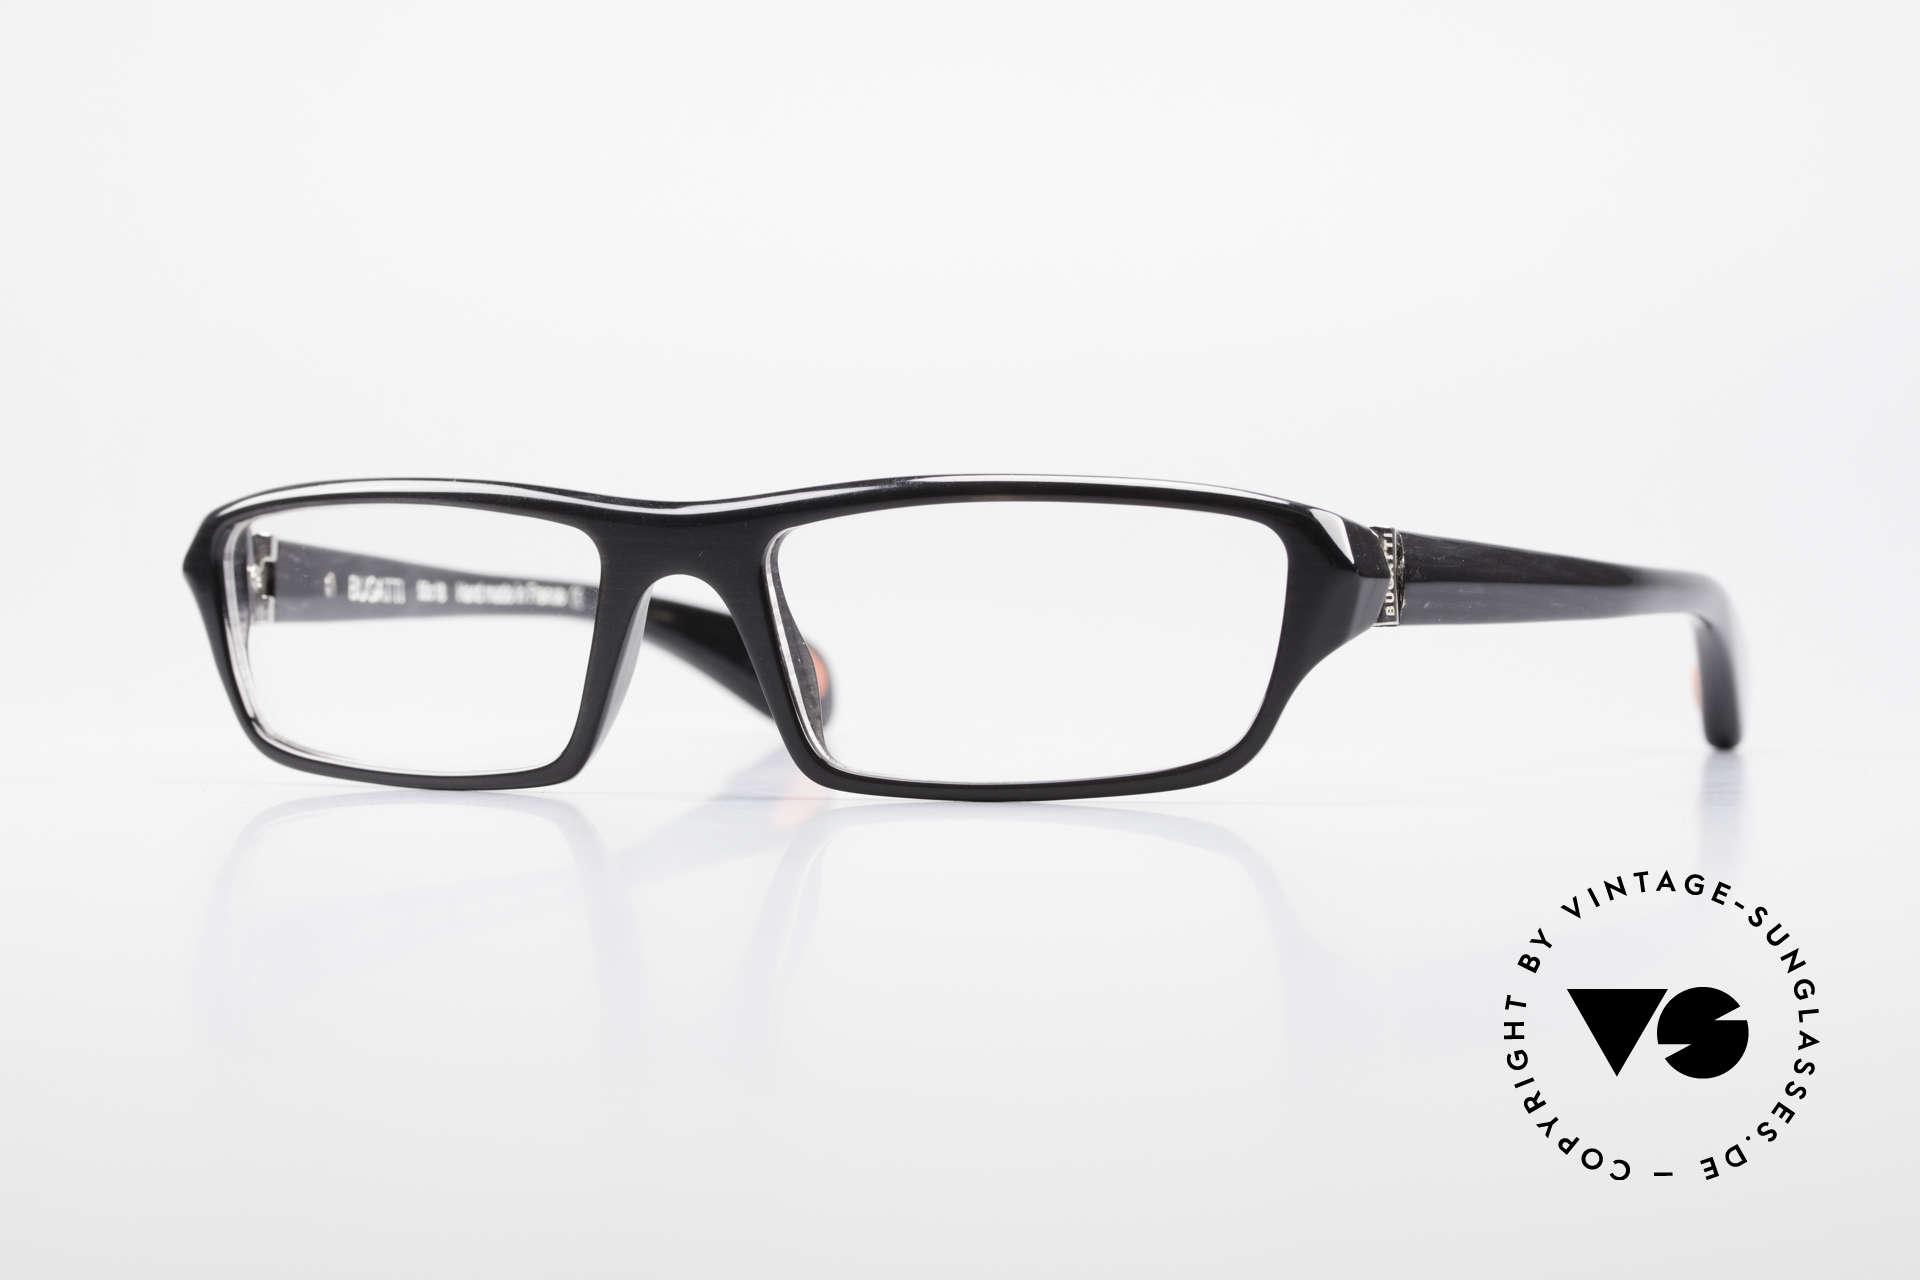 Bugatti 470 Limited Luxury Eyeglasses Men, classic high-tech eyeglass-frame by BUGATTI, Made for Men